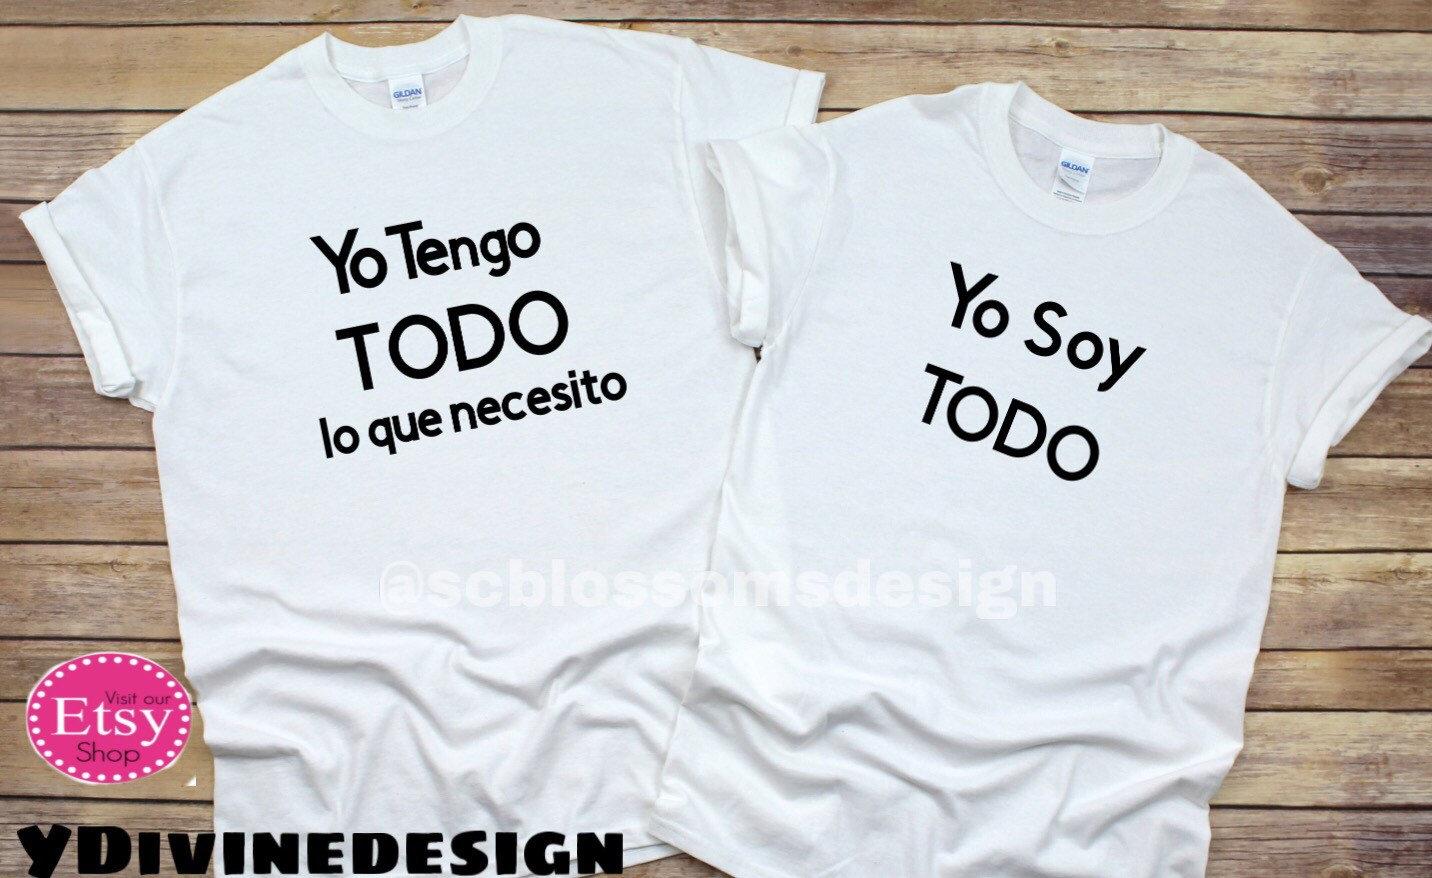 Solo tengo ojos camisa parejas Funny shirts Camisas en espa\u00f1ol Couples shirt